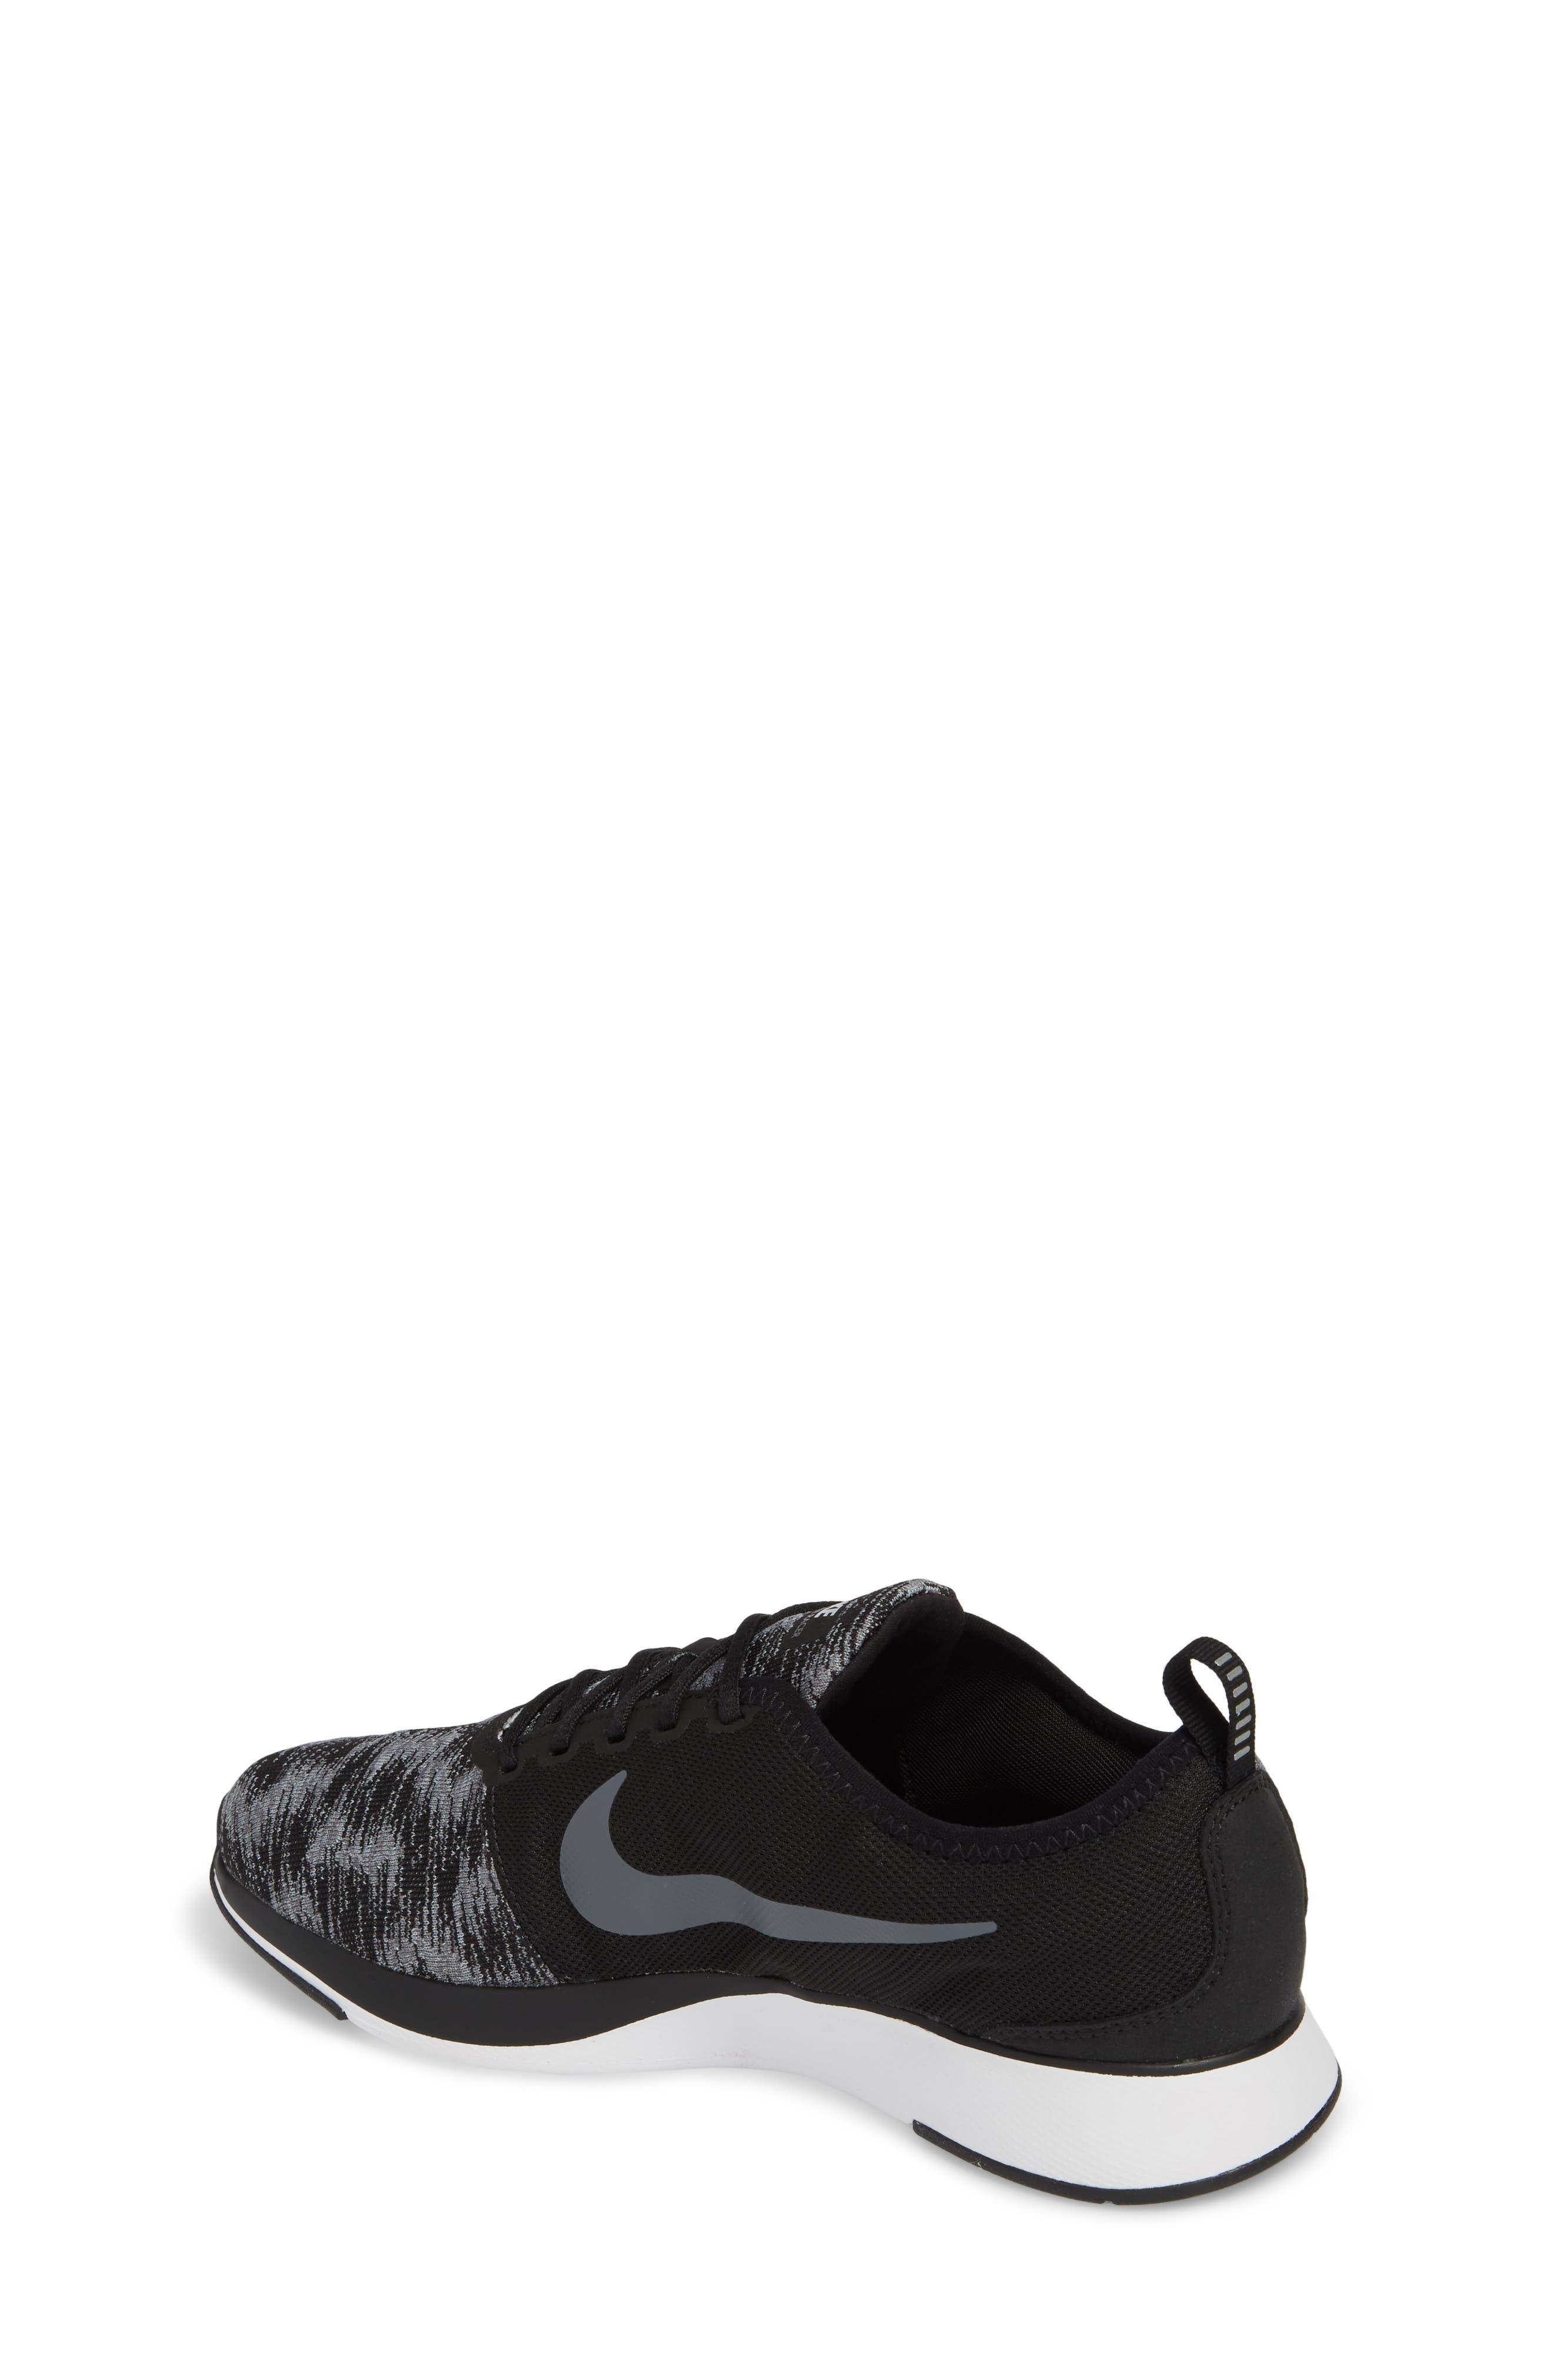 Dualtone Racer SE Sneaker,                             Alternate thumbnail 2, color,                             004